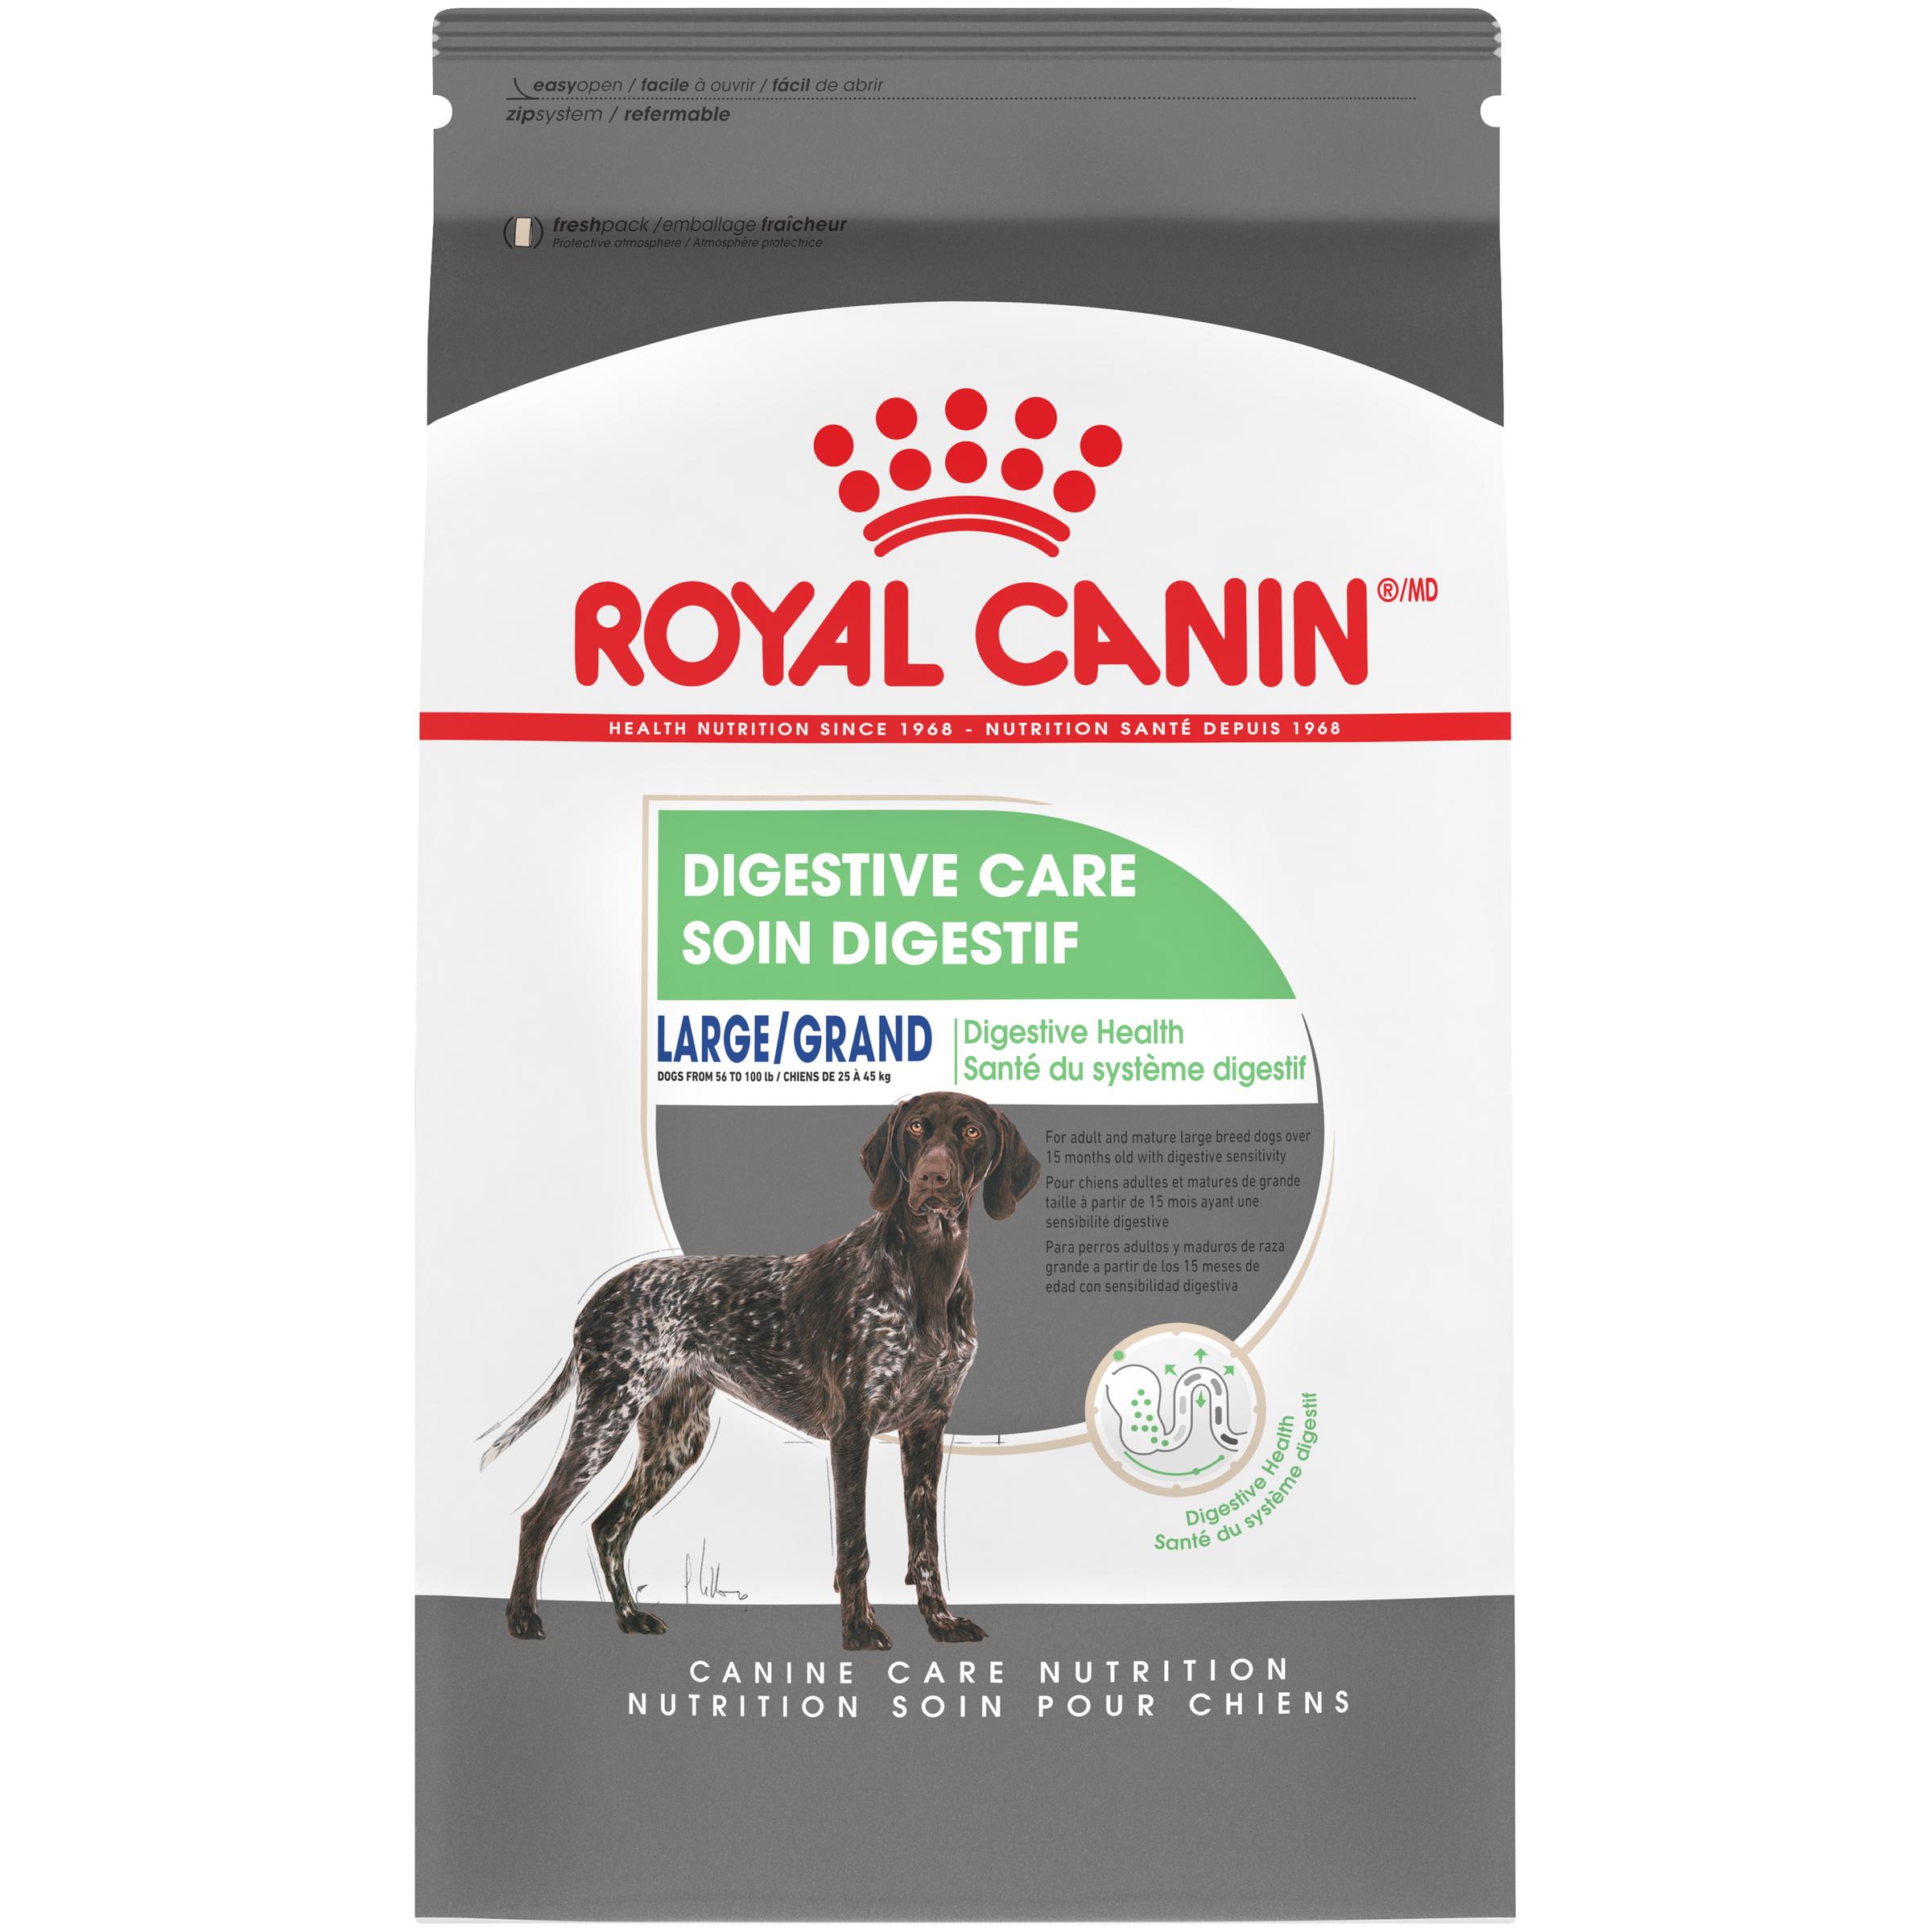 Royal Canin Canine Care Nutrition Large Digestive Care Dry Dog Food Image